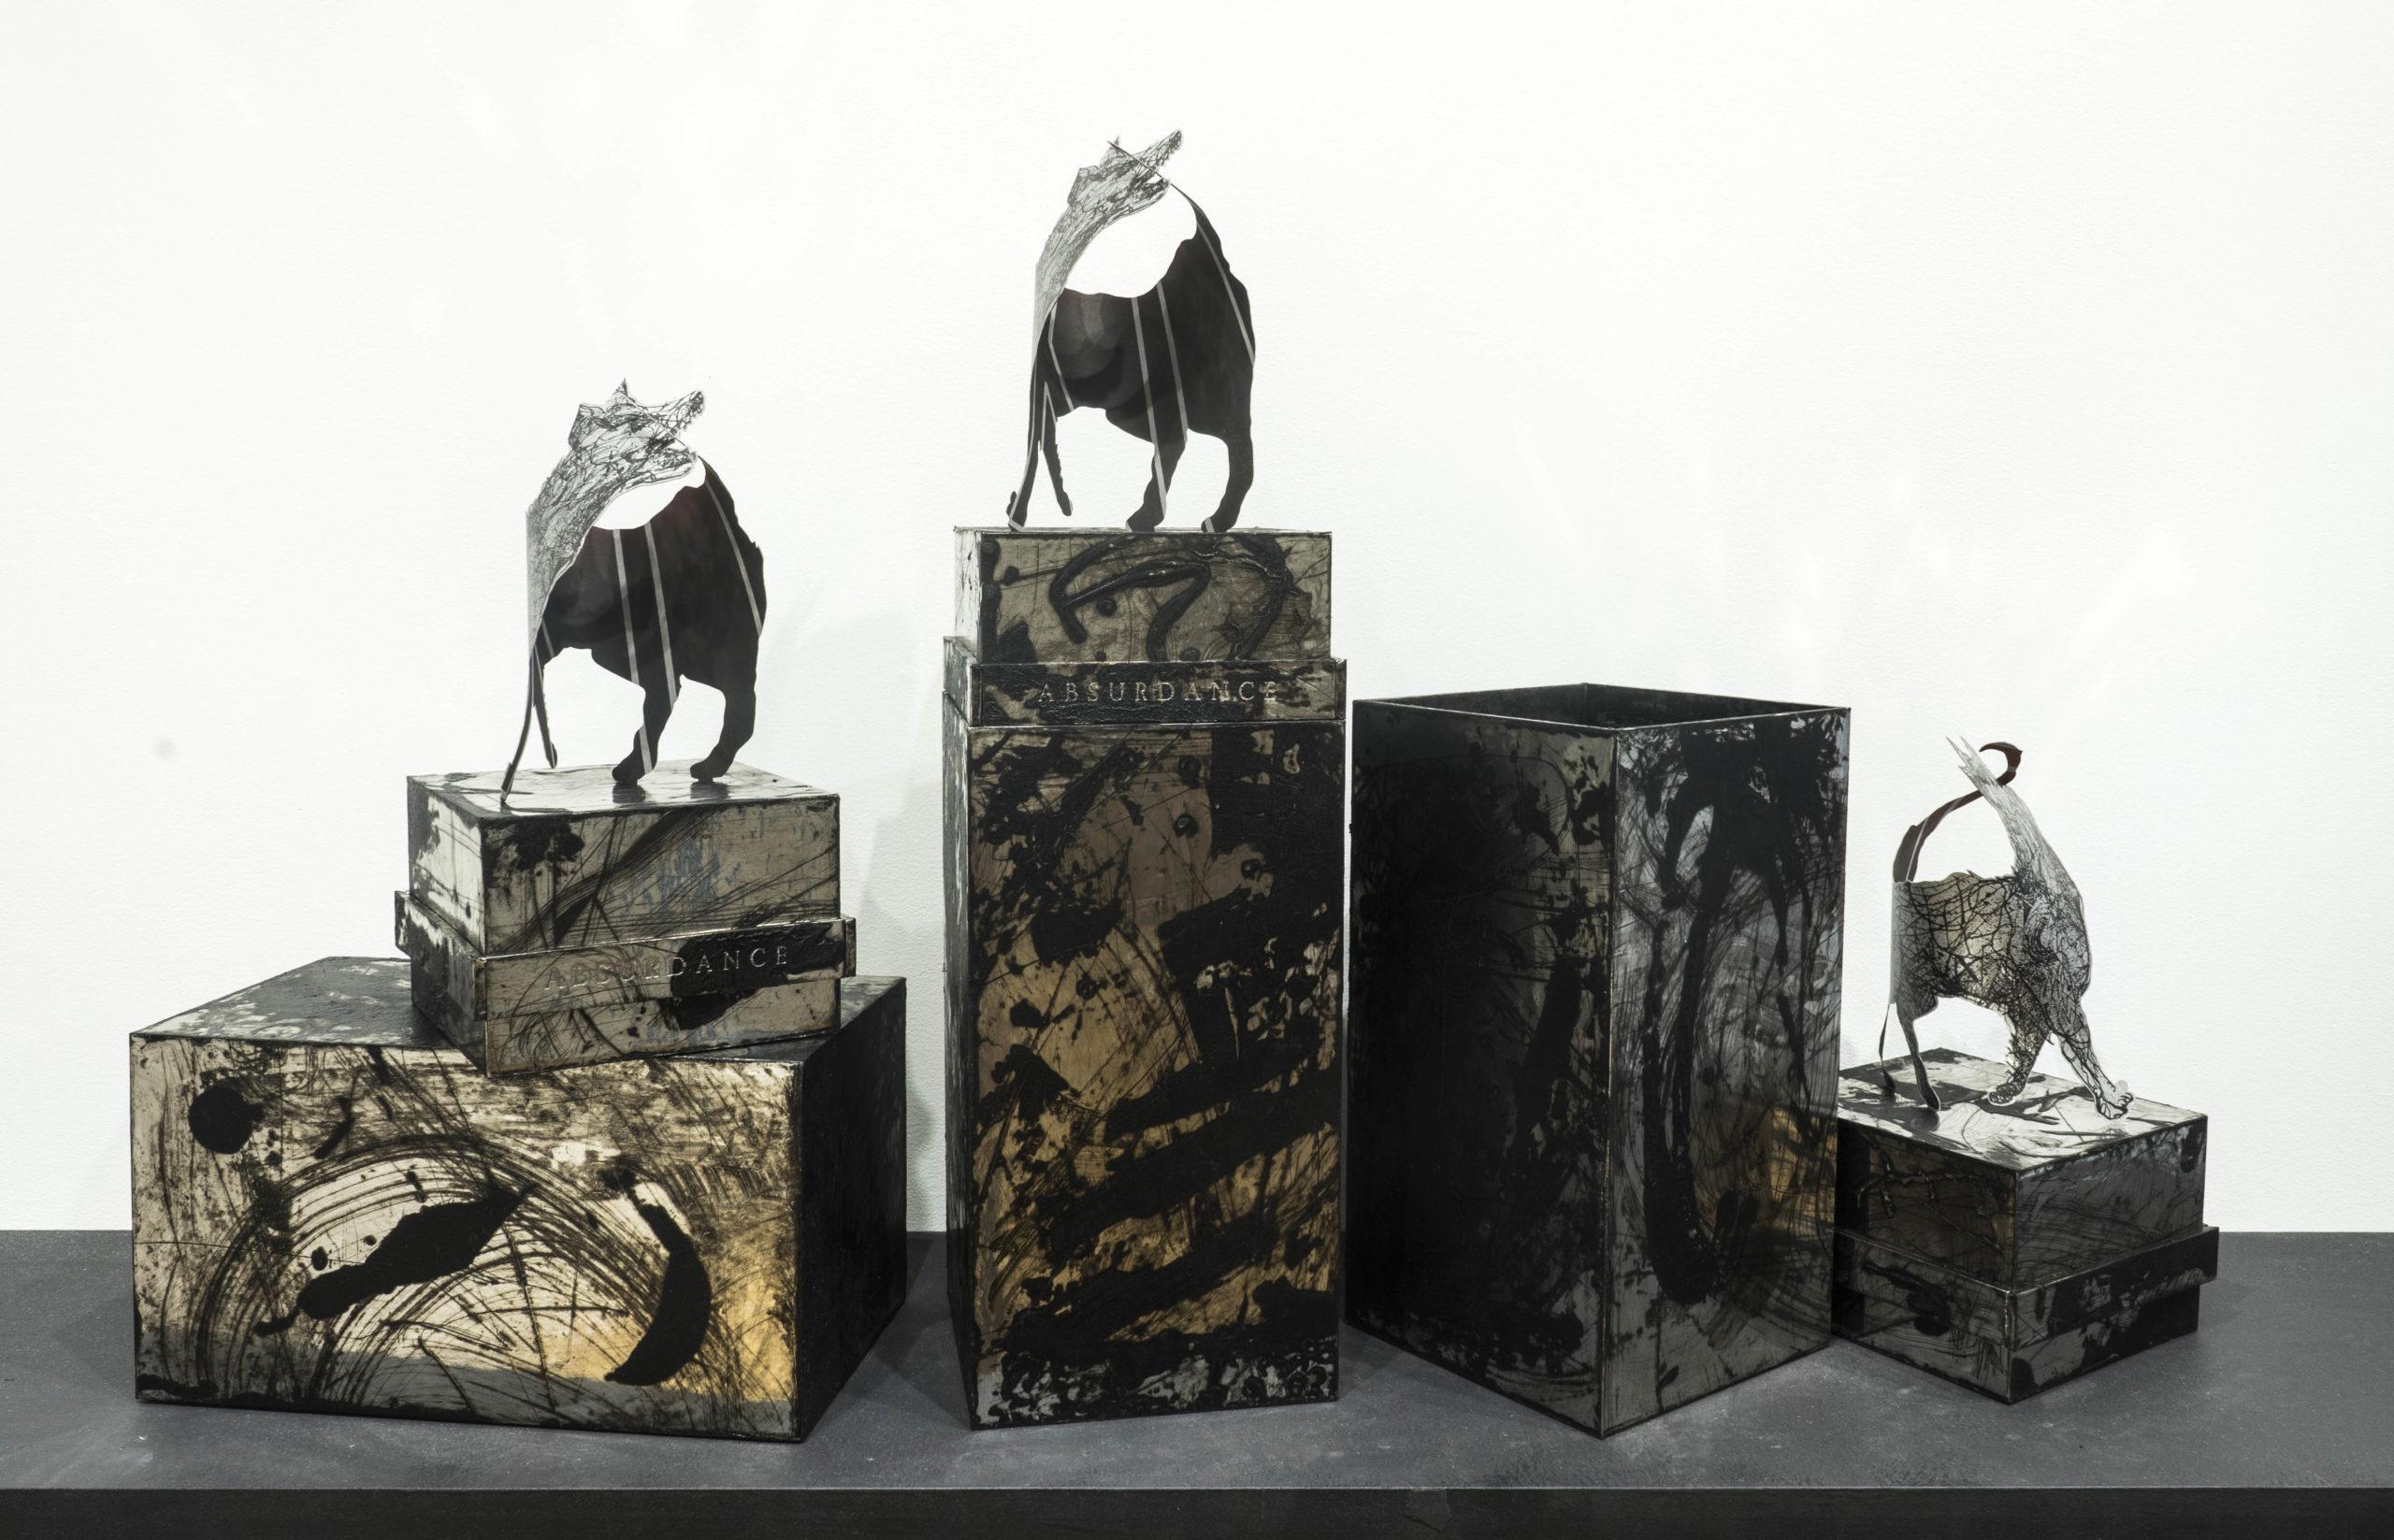 Three Sculptures of metallic Paper Dogs